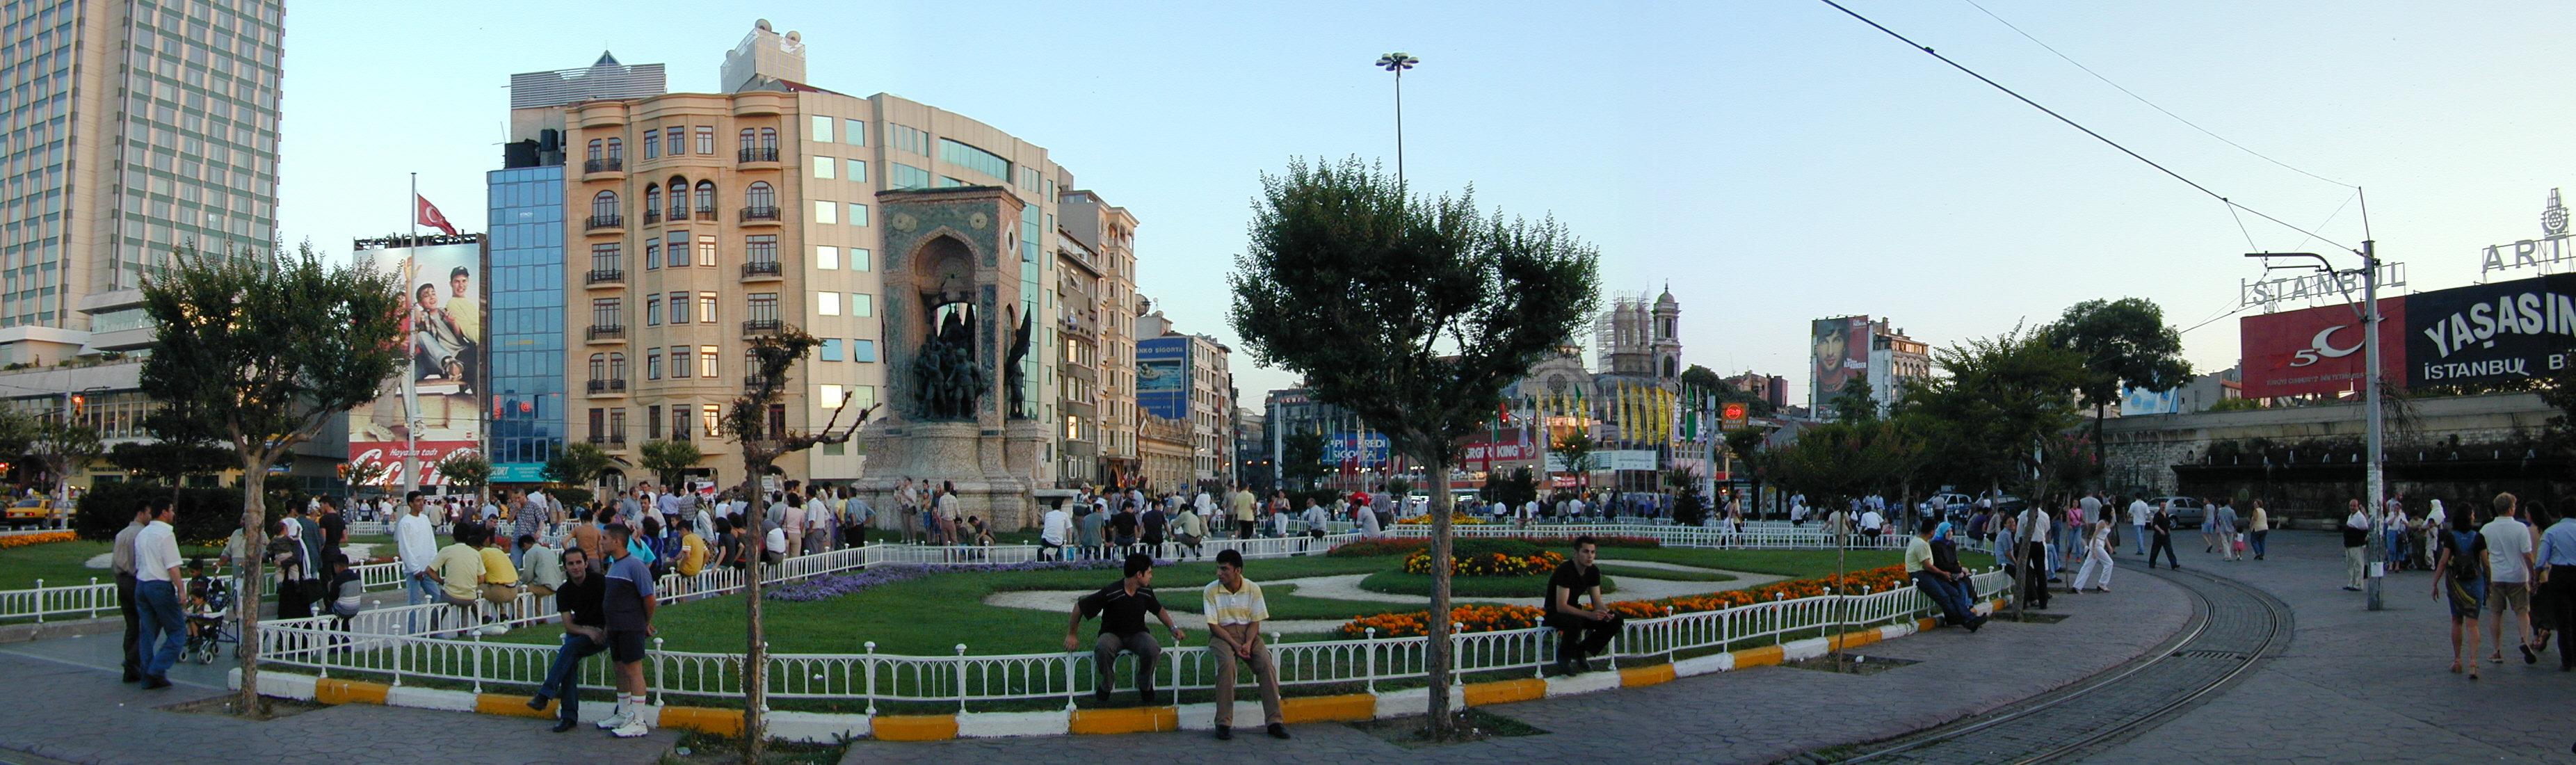 Takism Square, Istanbul, Turkey